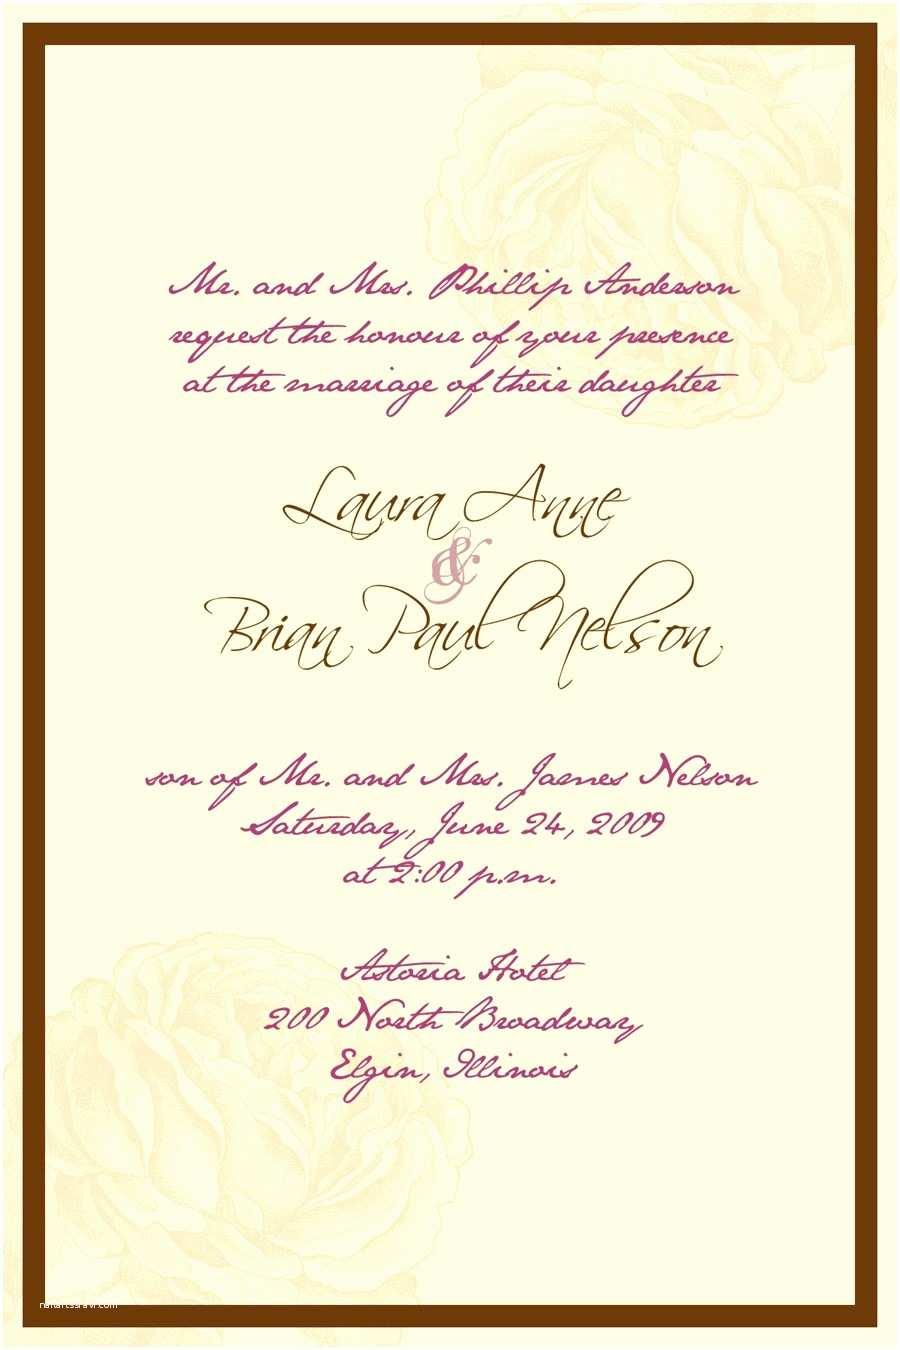 Christian Wedding Invitation Wording Samples From Bride and Groom Catholic Wedding Invitation Wording